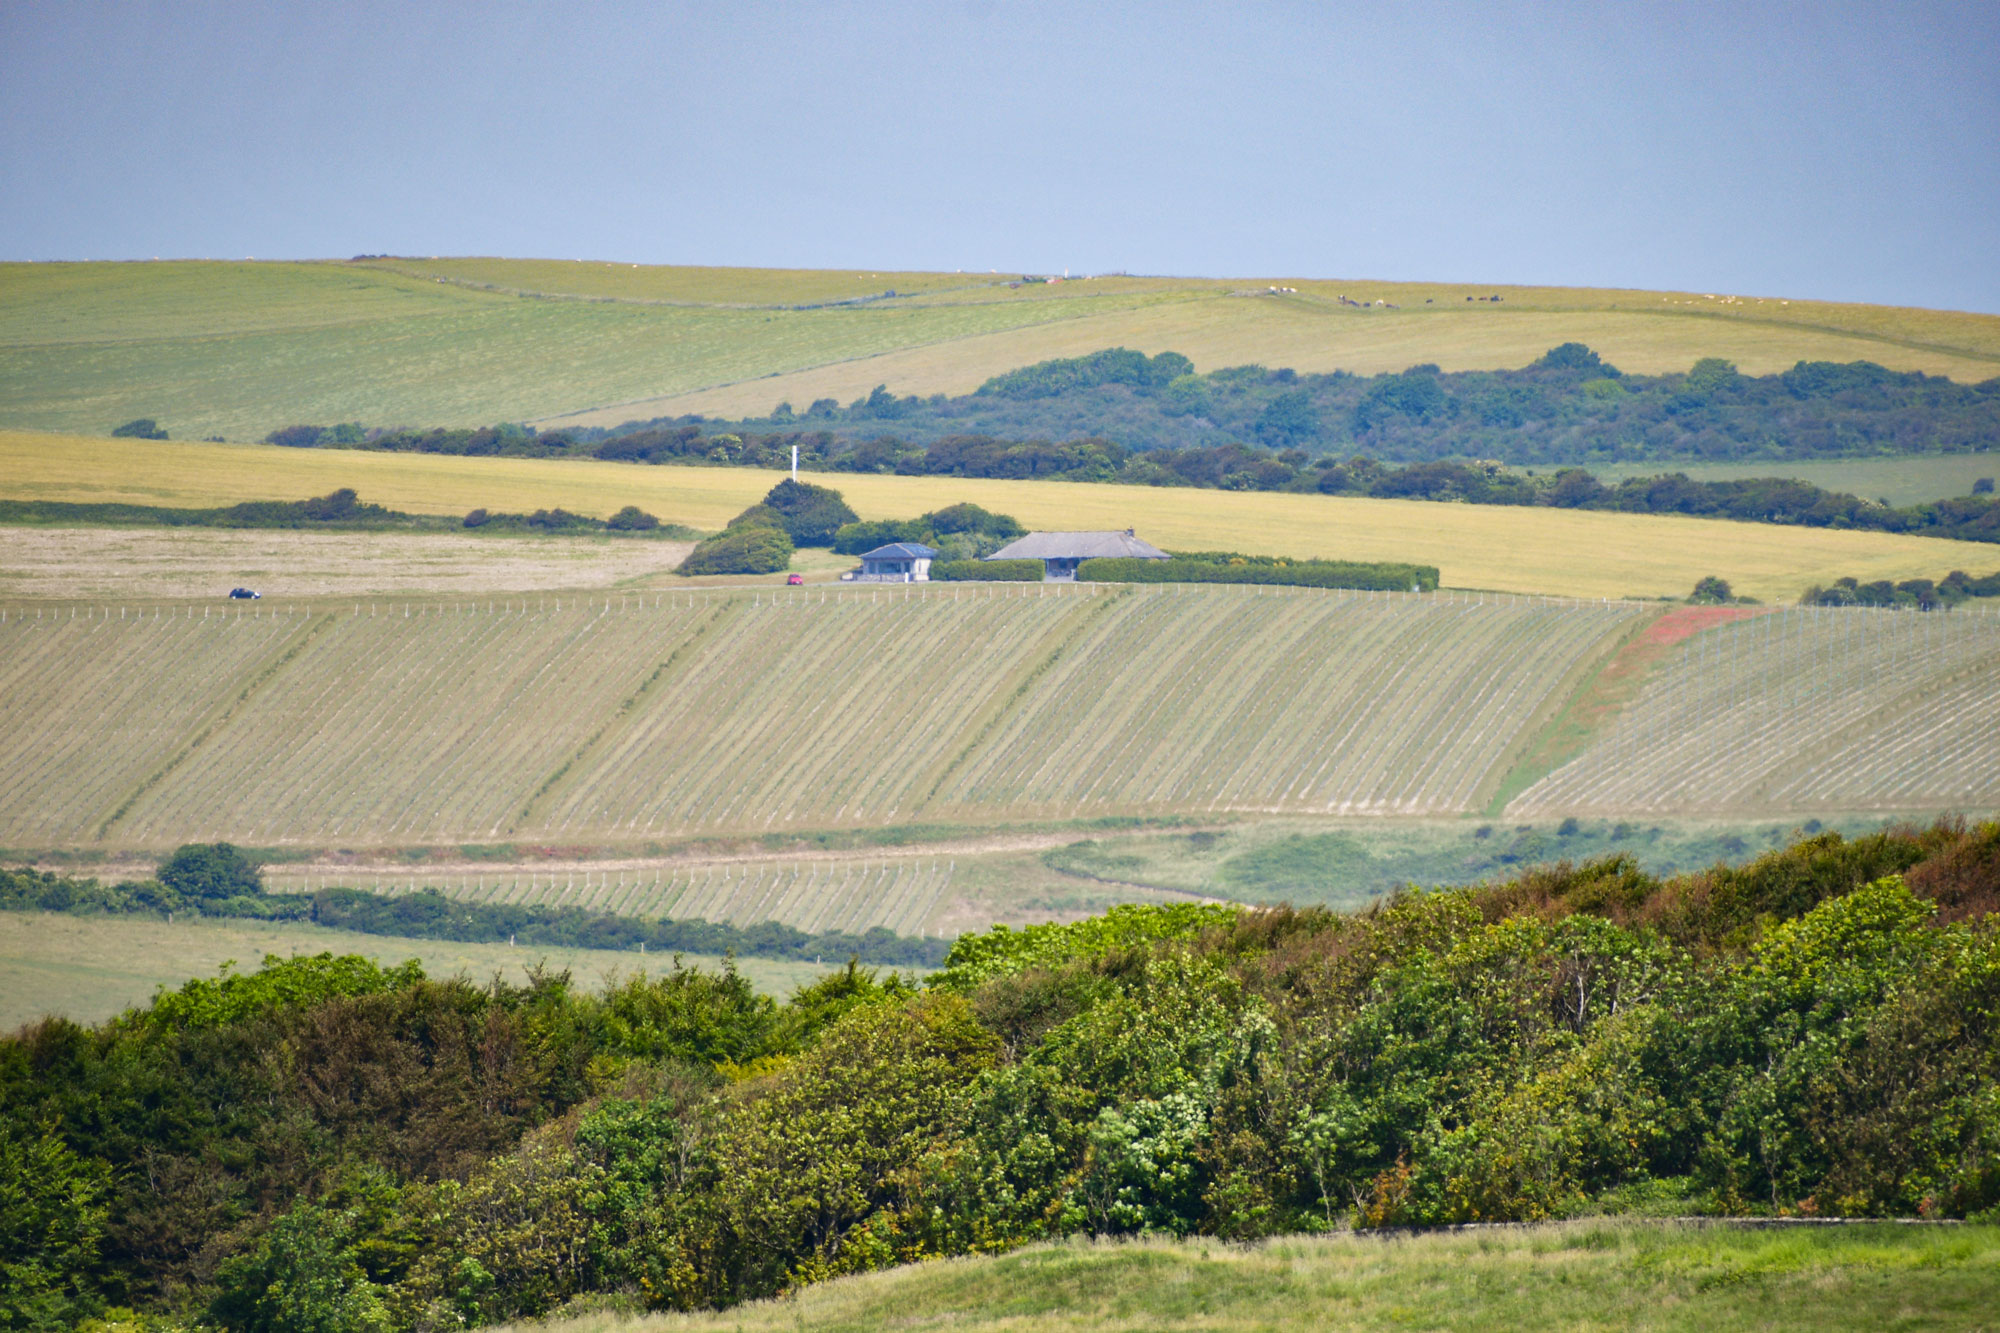 Le vignoble de Rachfinny farm © French Moments